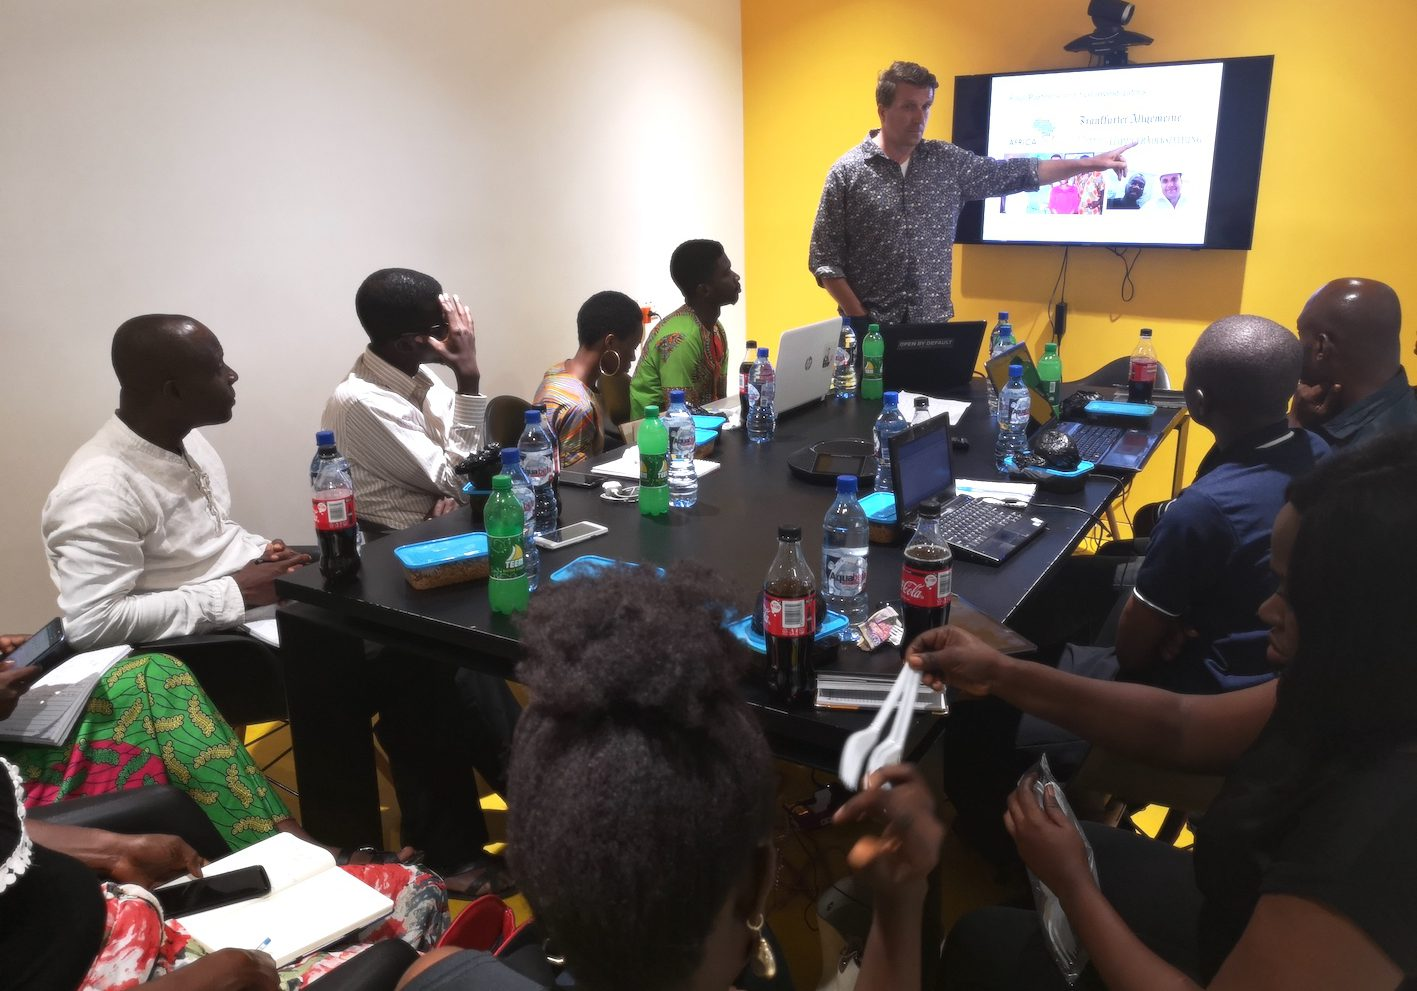 Hacks & Hackers-Journalistentreffen in Lagos, Nigeria (c) Lutz Mükke